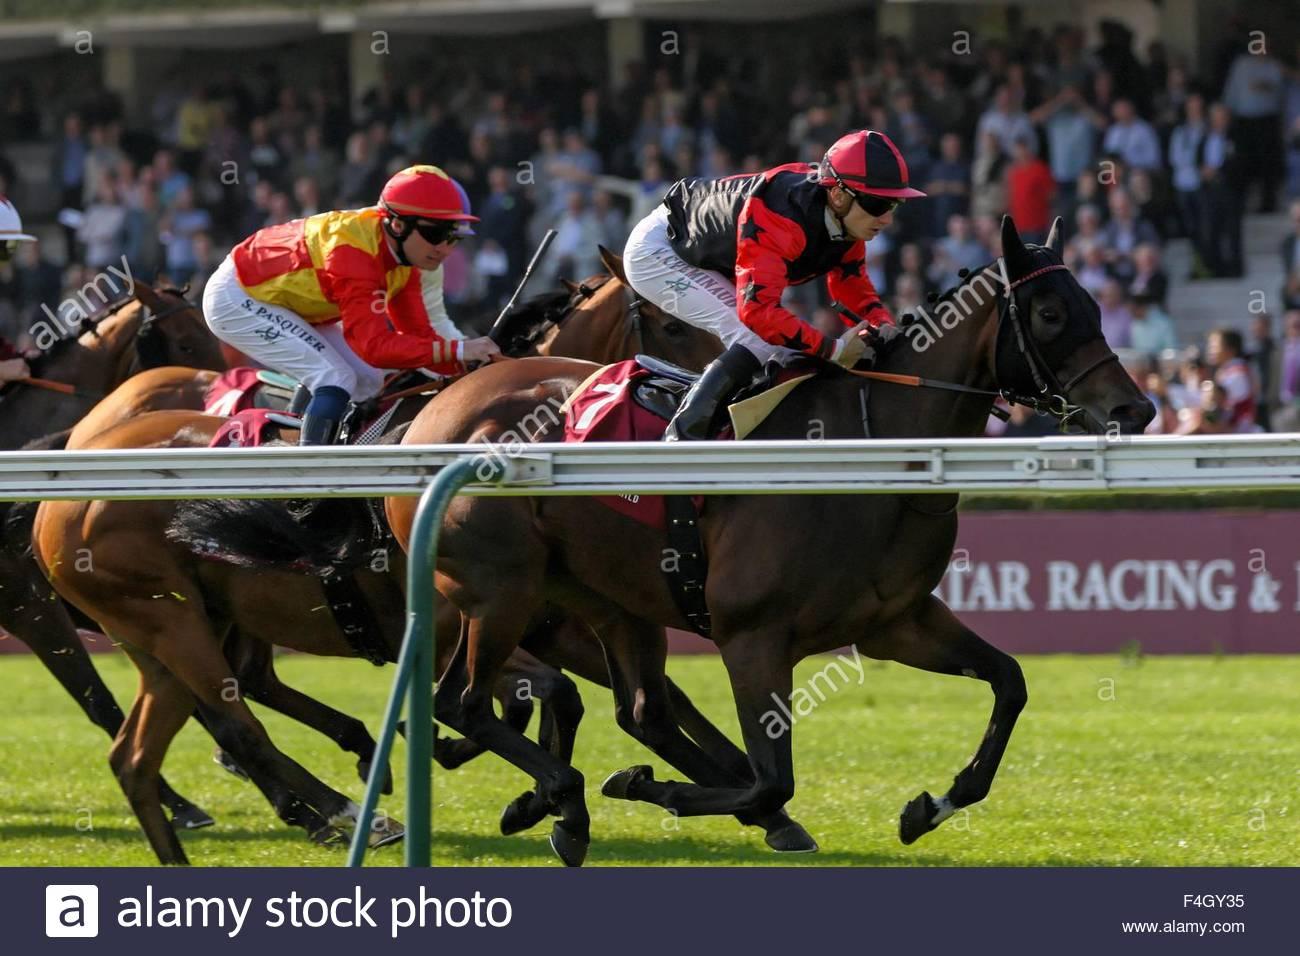 Paris, France. October 3rd, 2015. FRANCE, Paris: Jockeys get on horses during 94th Prix de l'Arc de Triomphe held Stock Photo